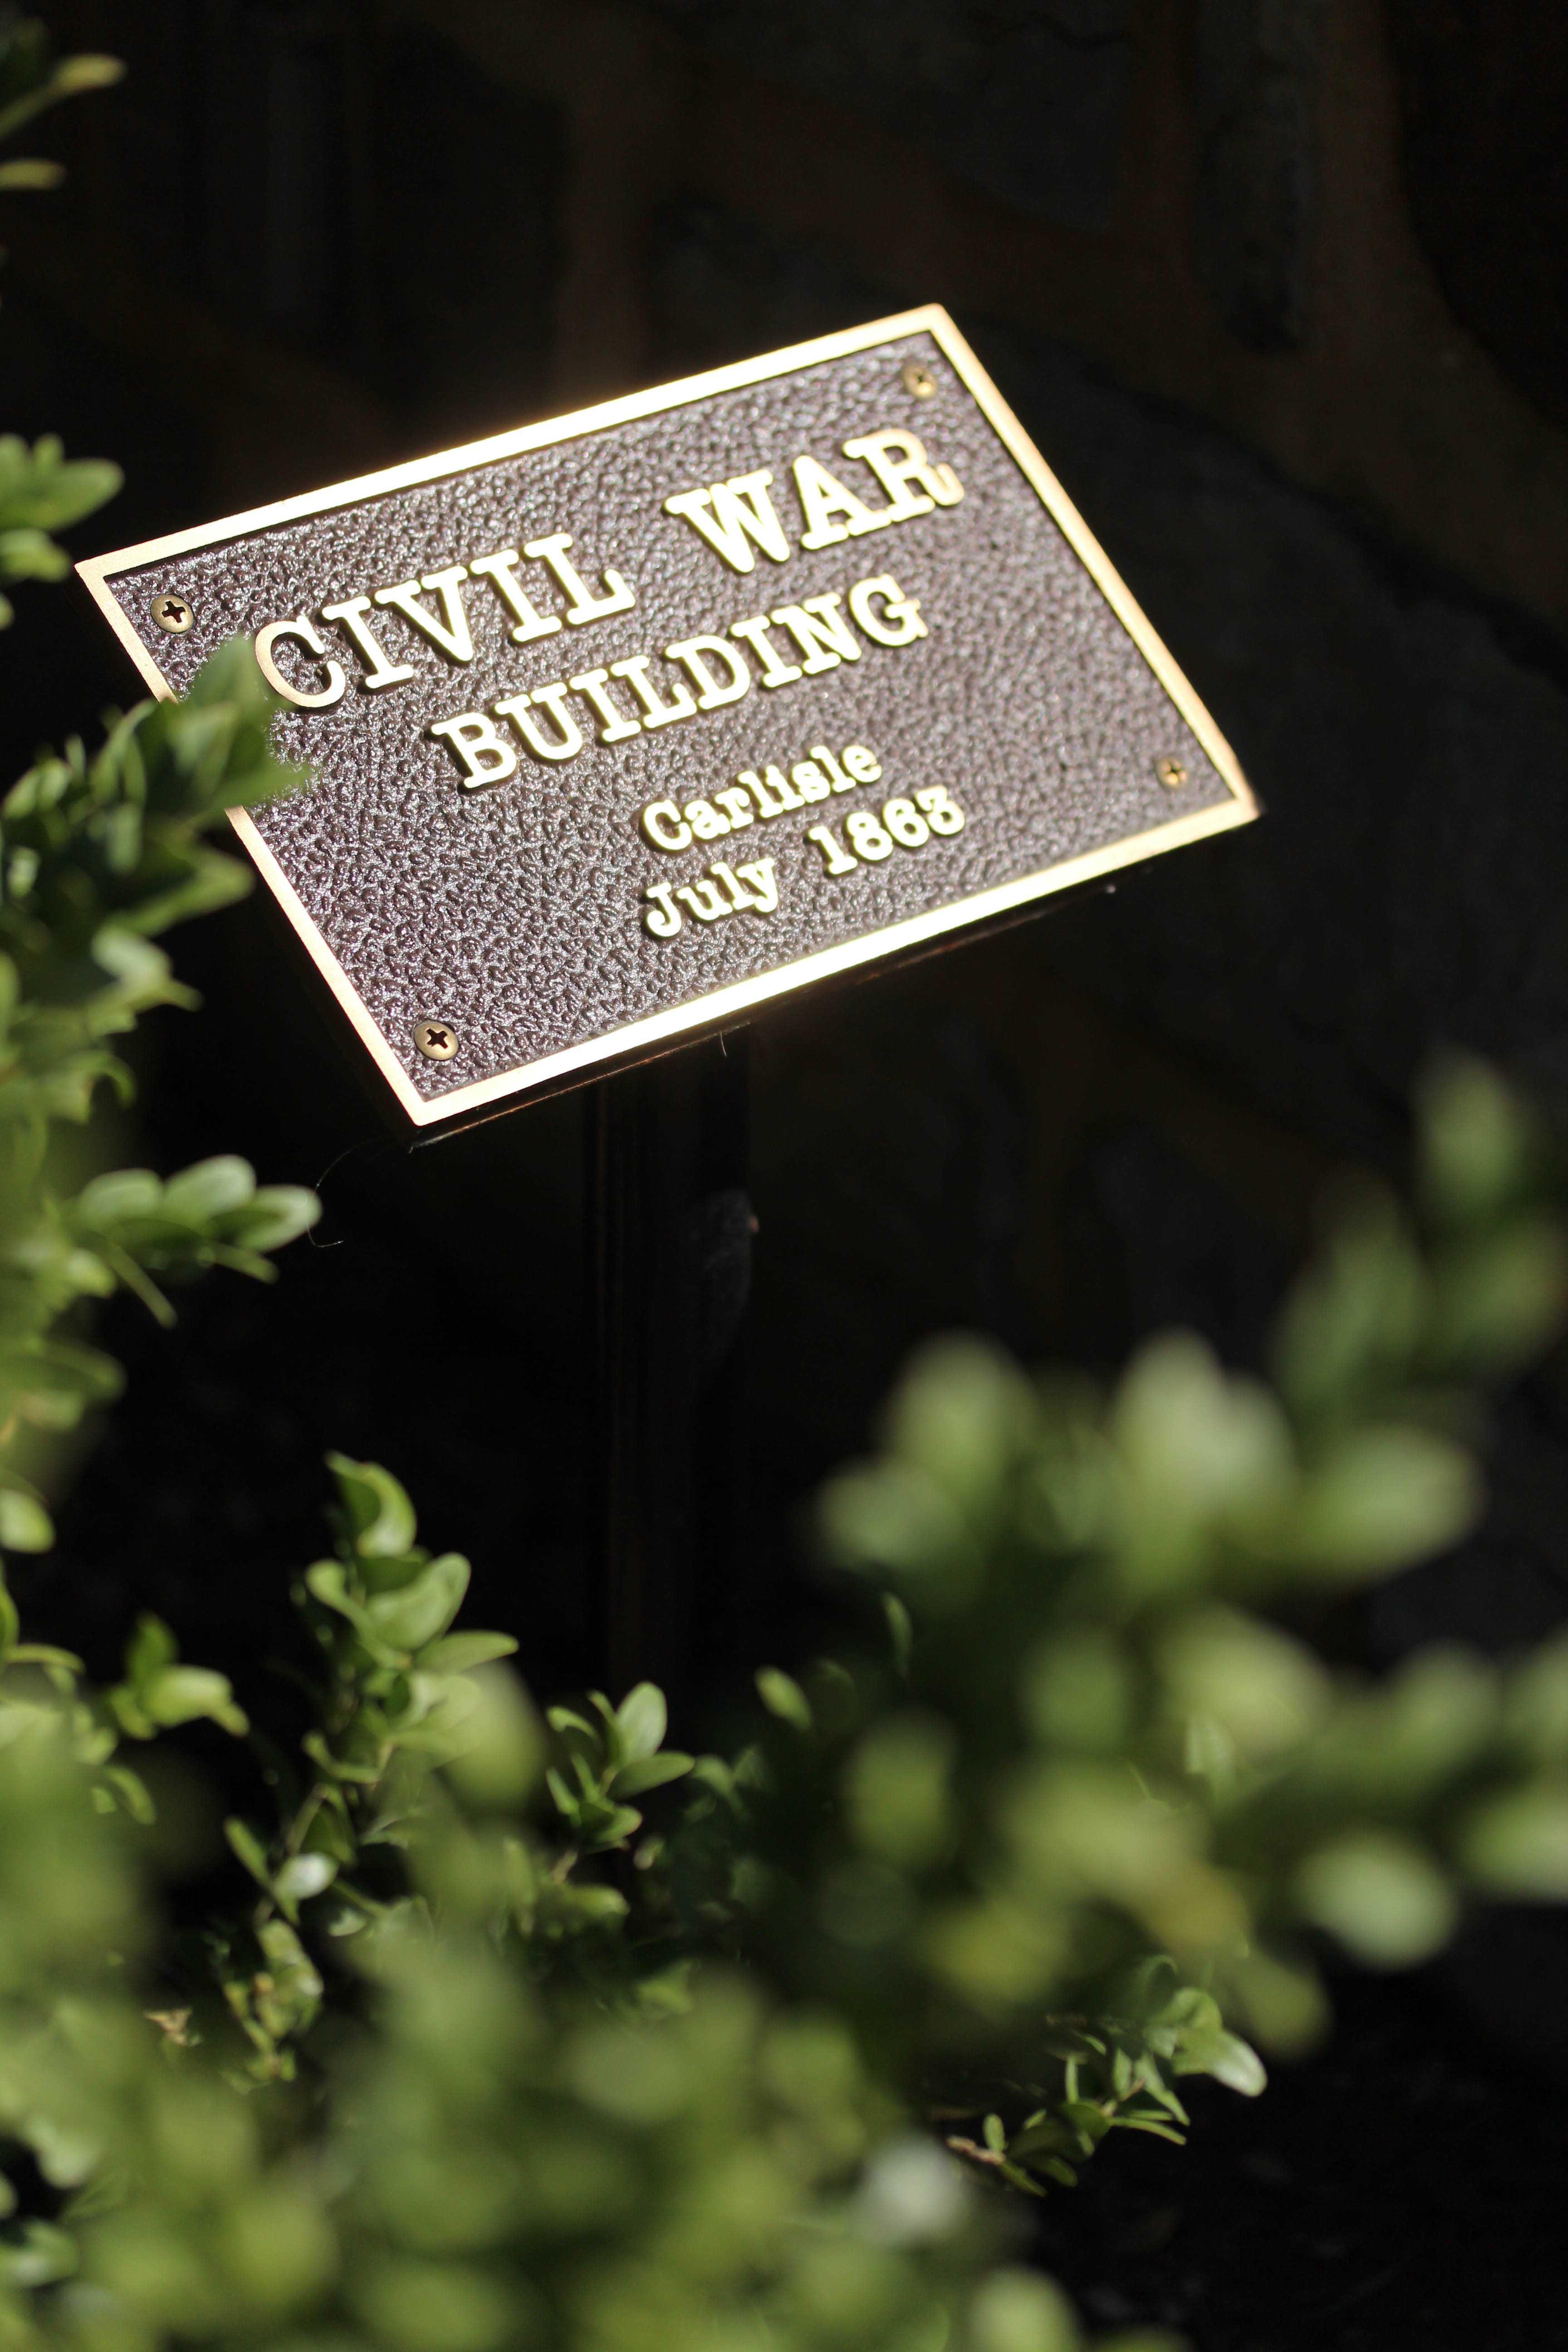 This plaque designates Old West as one of several Civil War era buildings on Dickinson's campus.